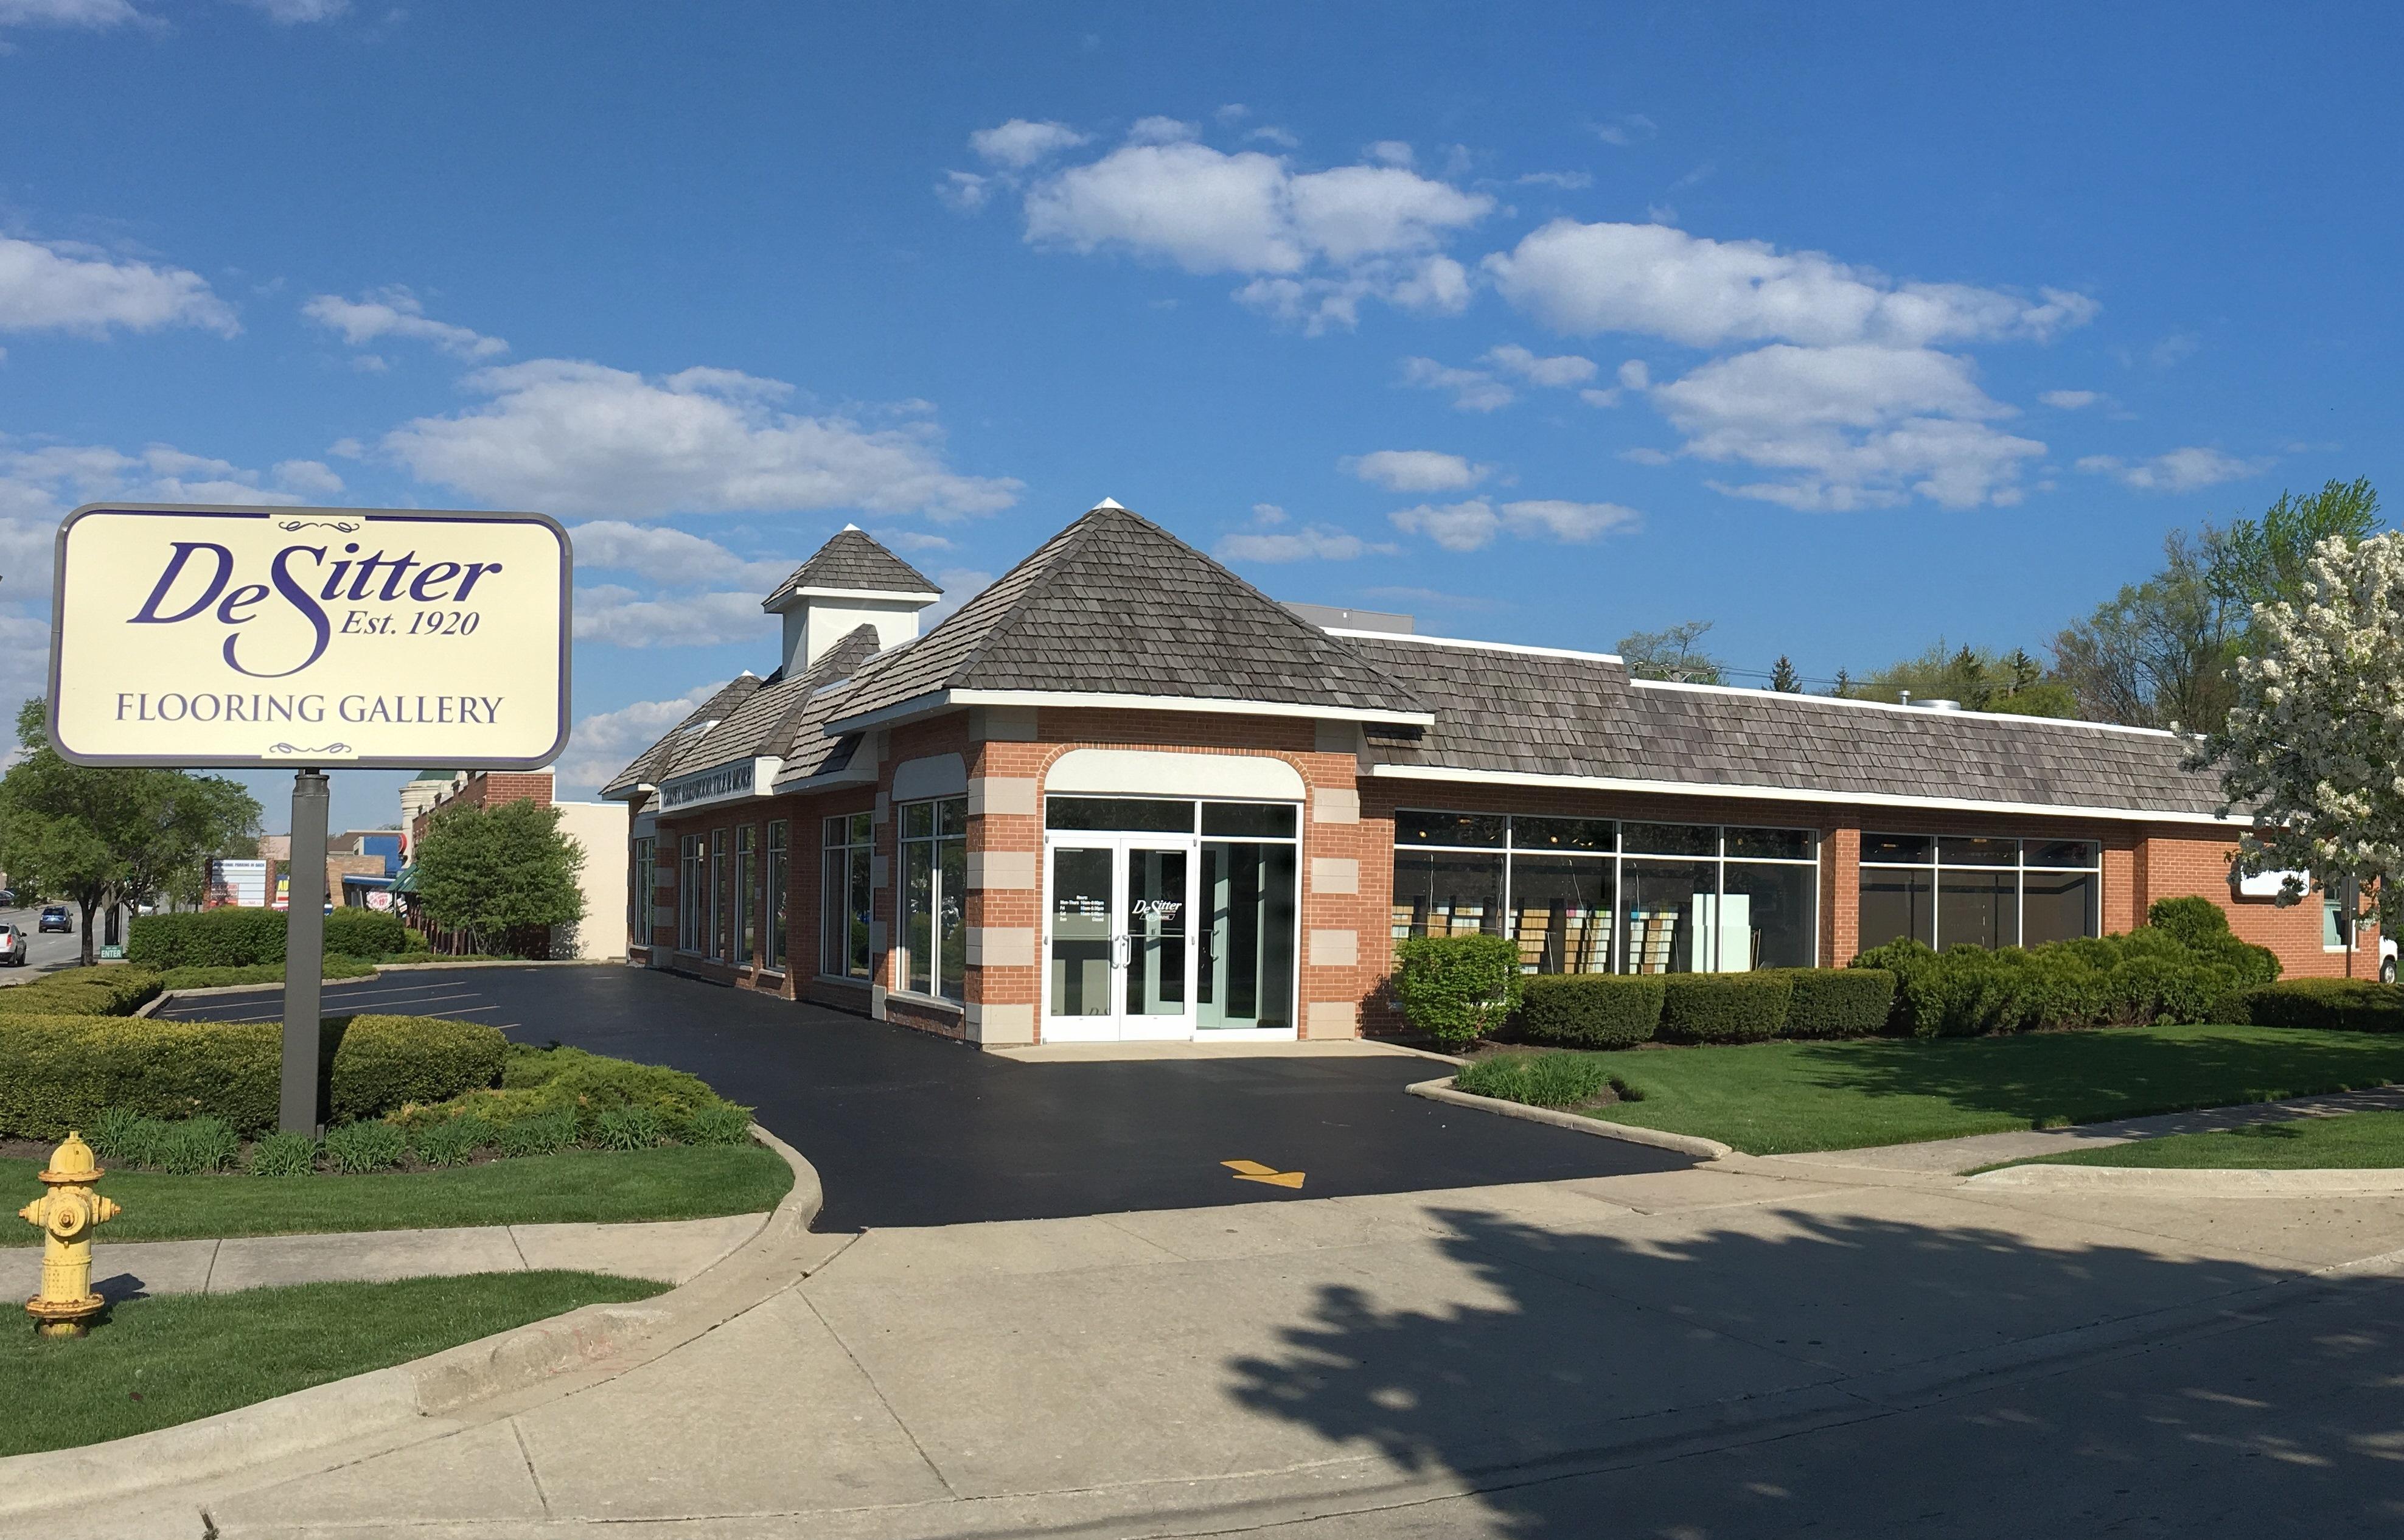 Desitter Flooring - 444 Roosevelt Rd Glen Ellyn, IL 60137